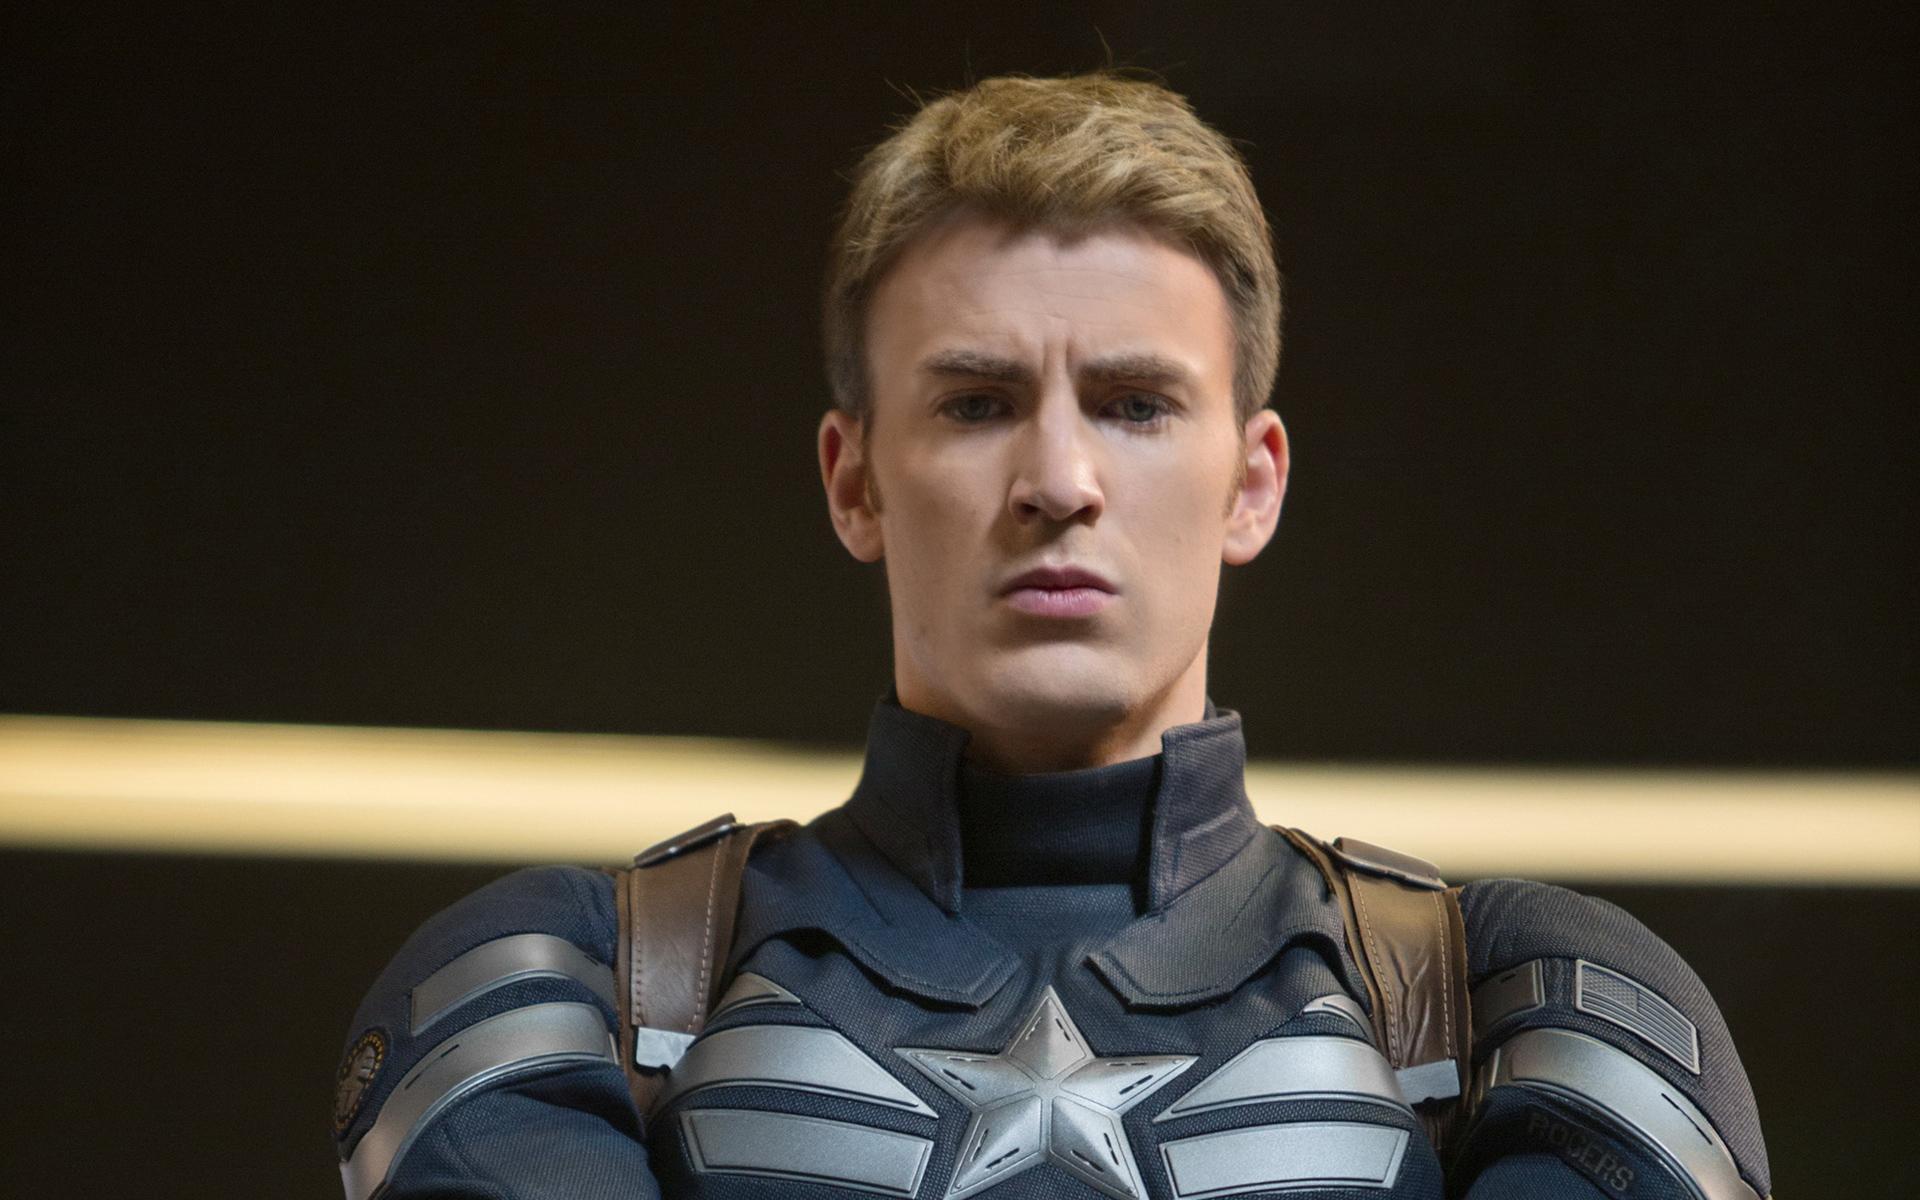 Captain America 2014 Chris Evans 50 HD Wallpaper